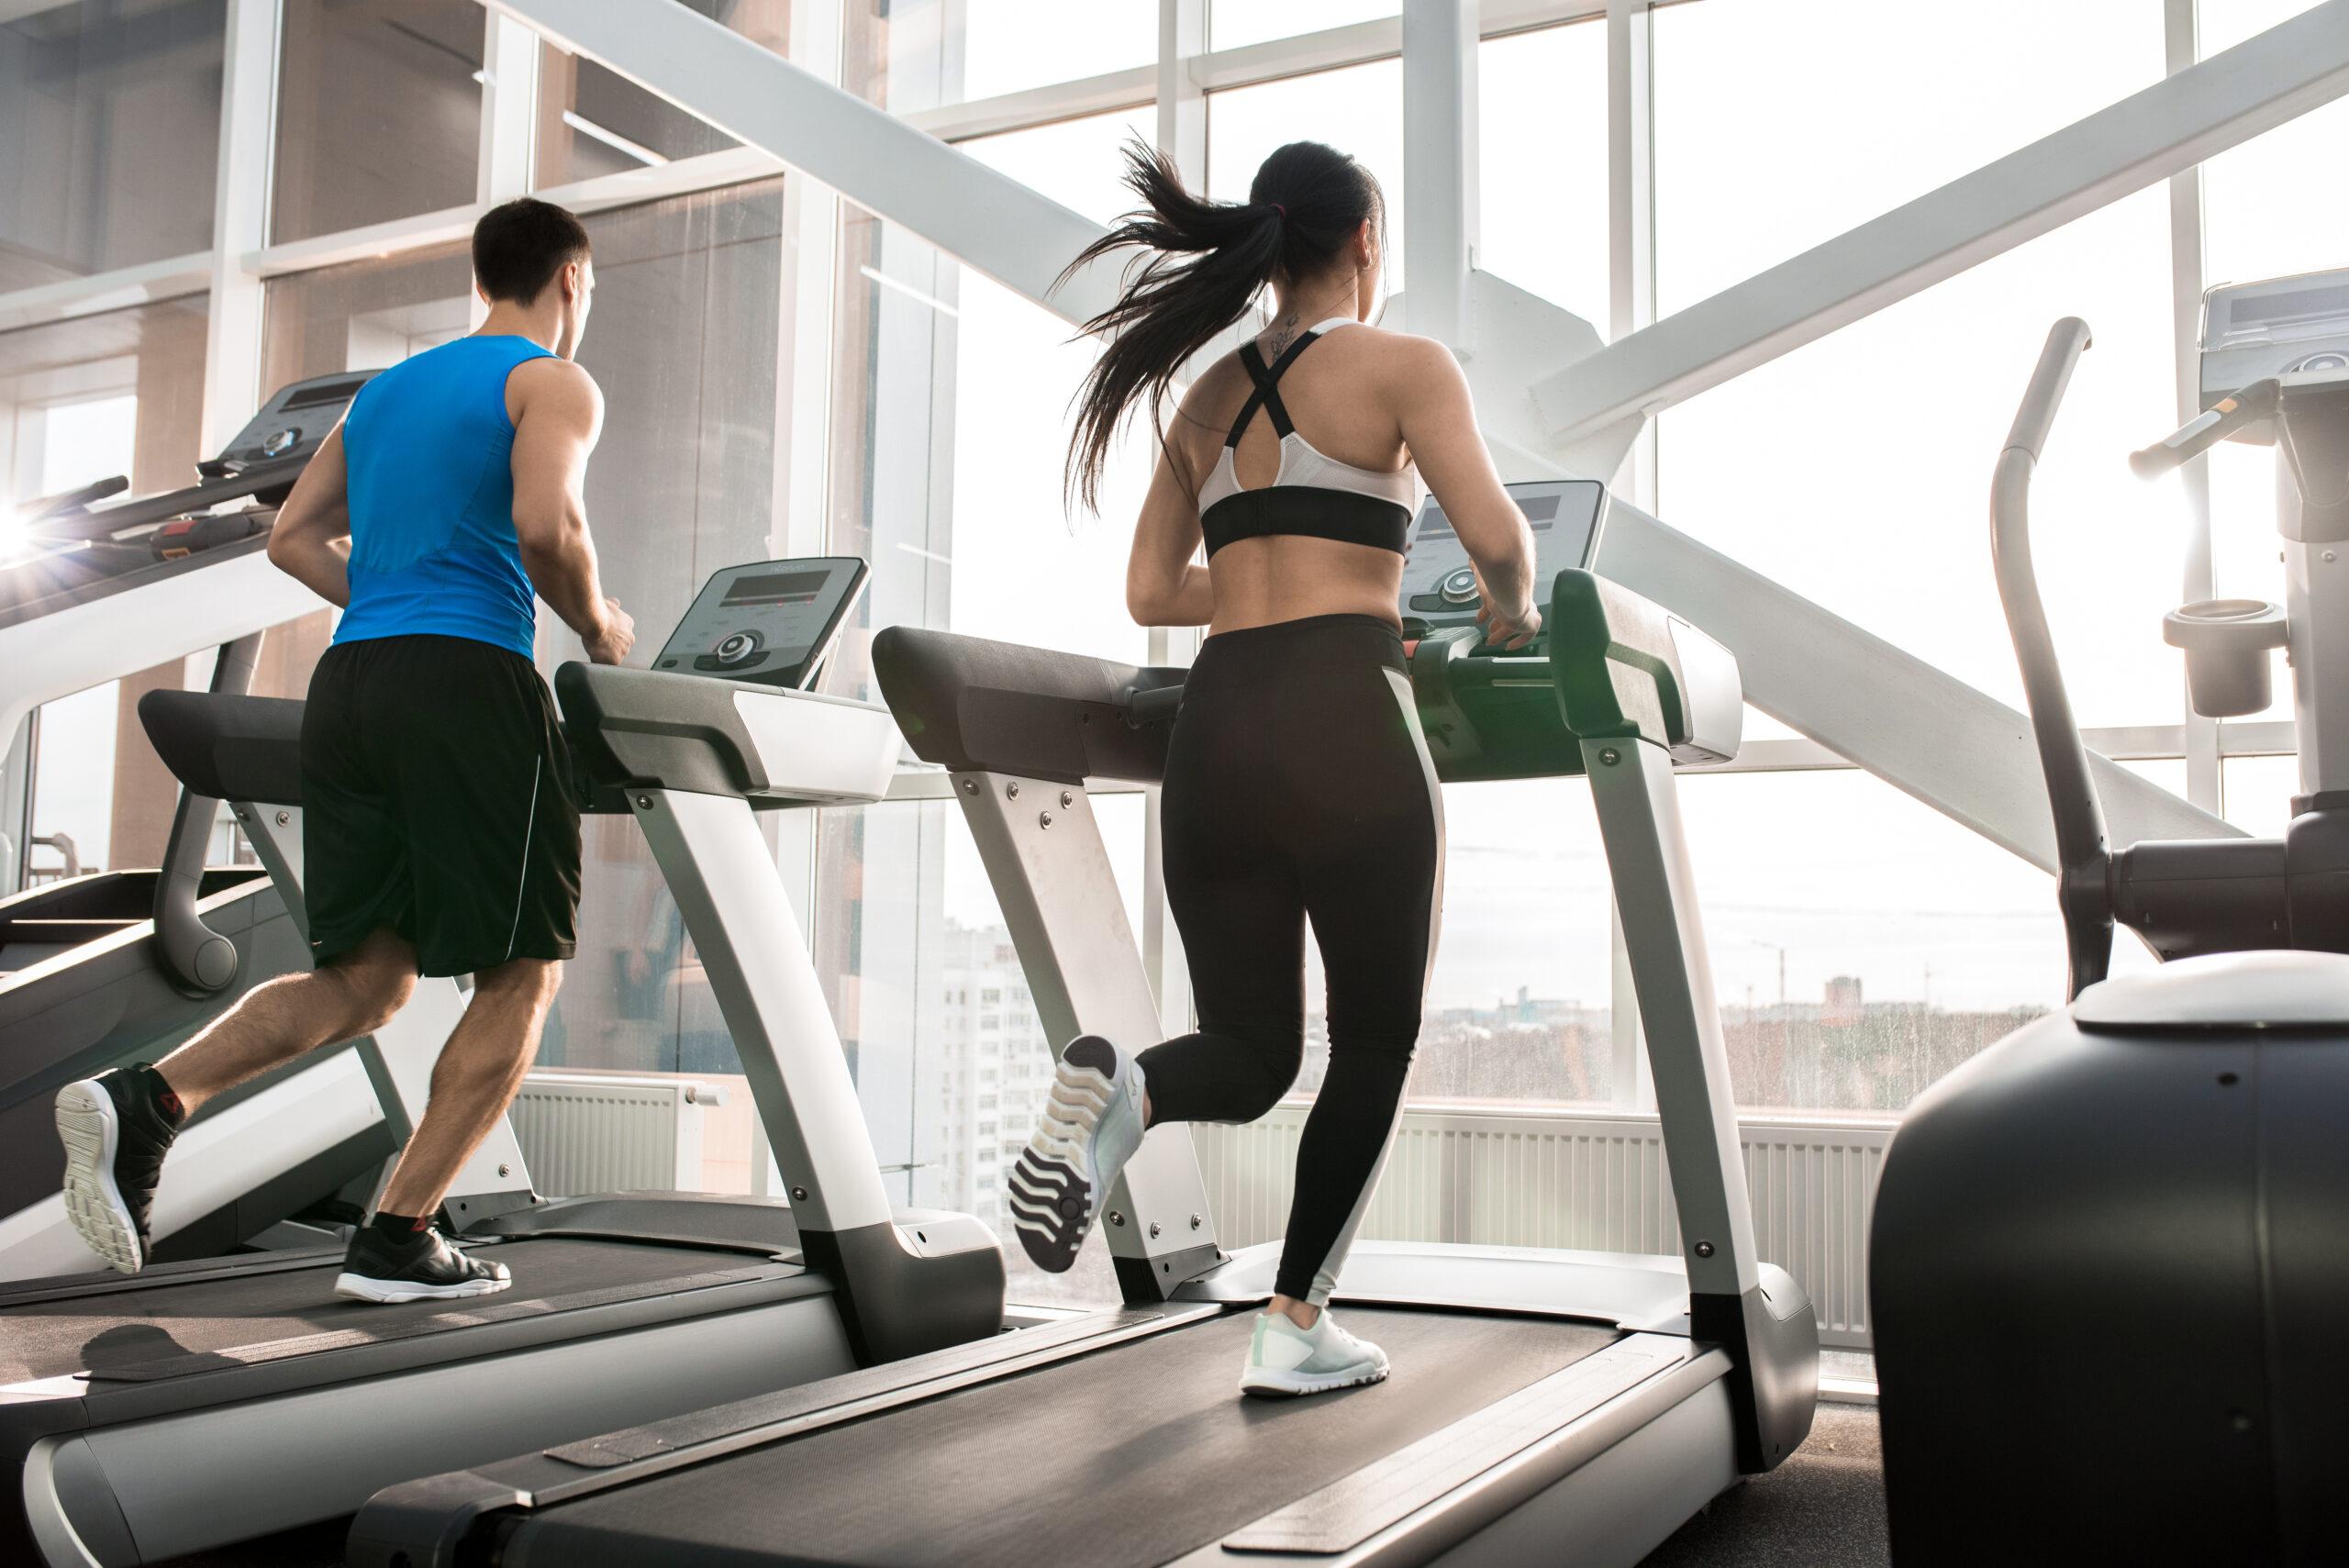 Gym Members Running on Treadmill